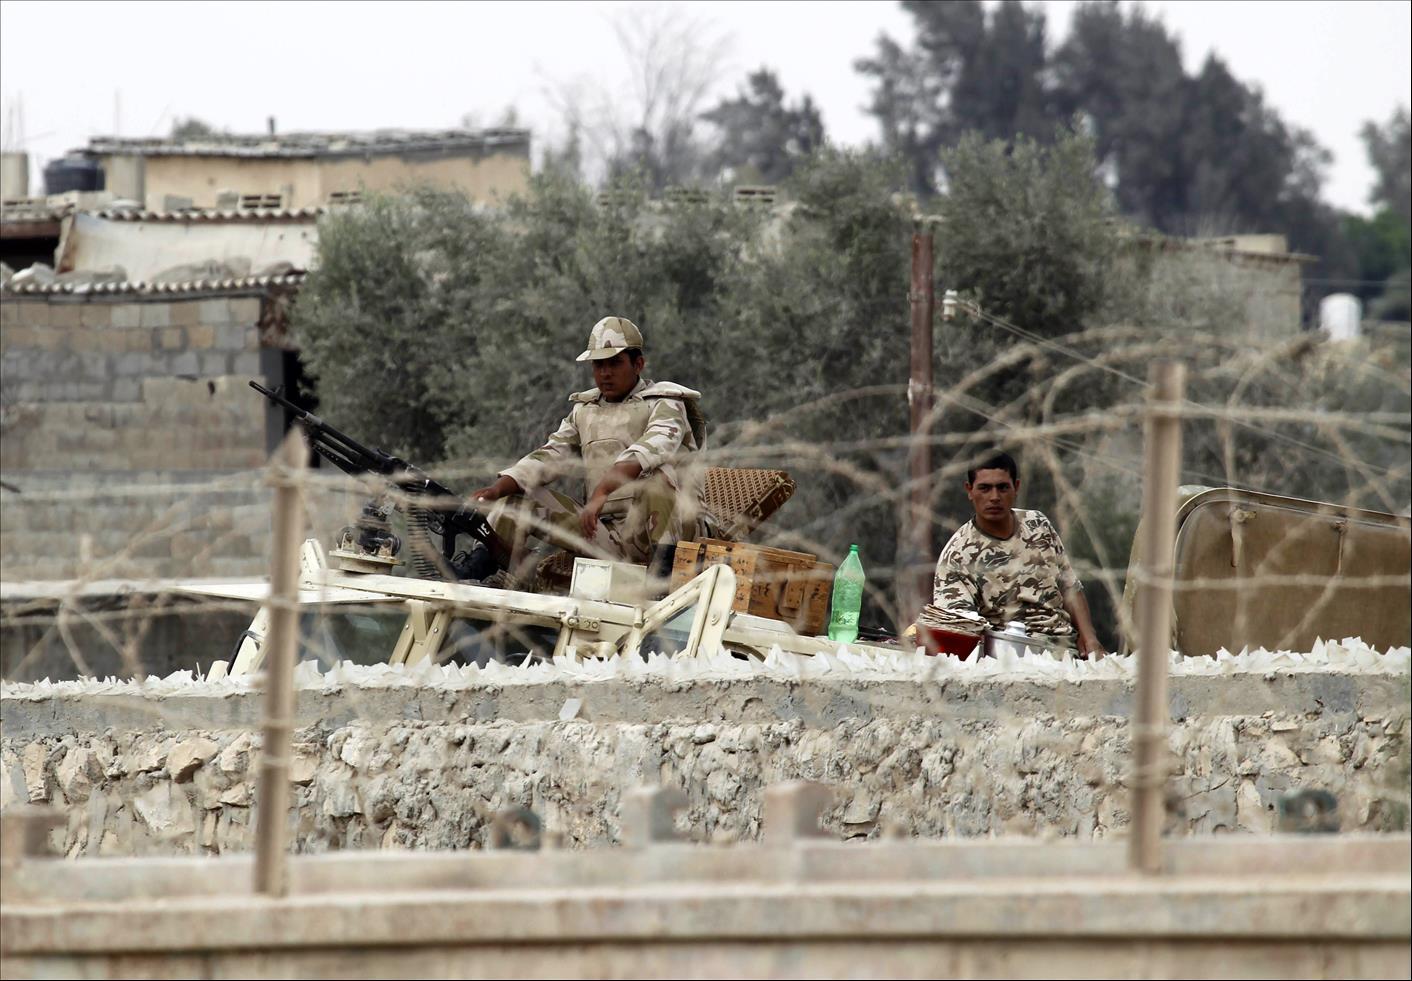 Egypt- 12 killed in air force raid against militants in North Sinai: military spokesperson